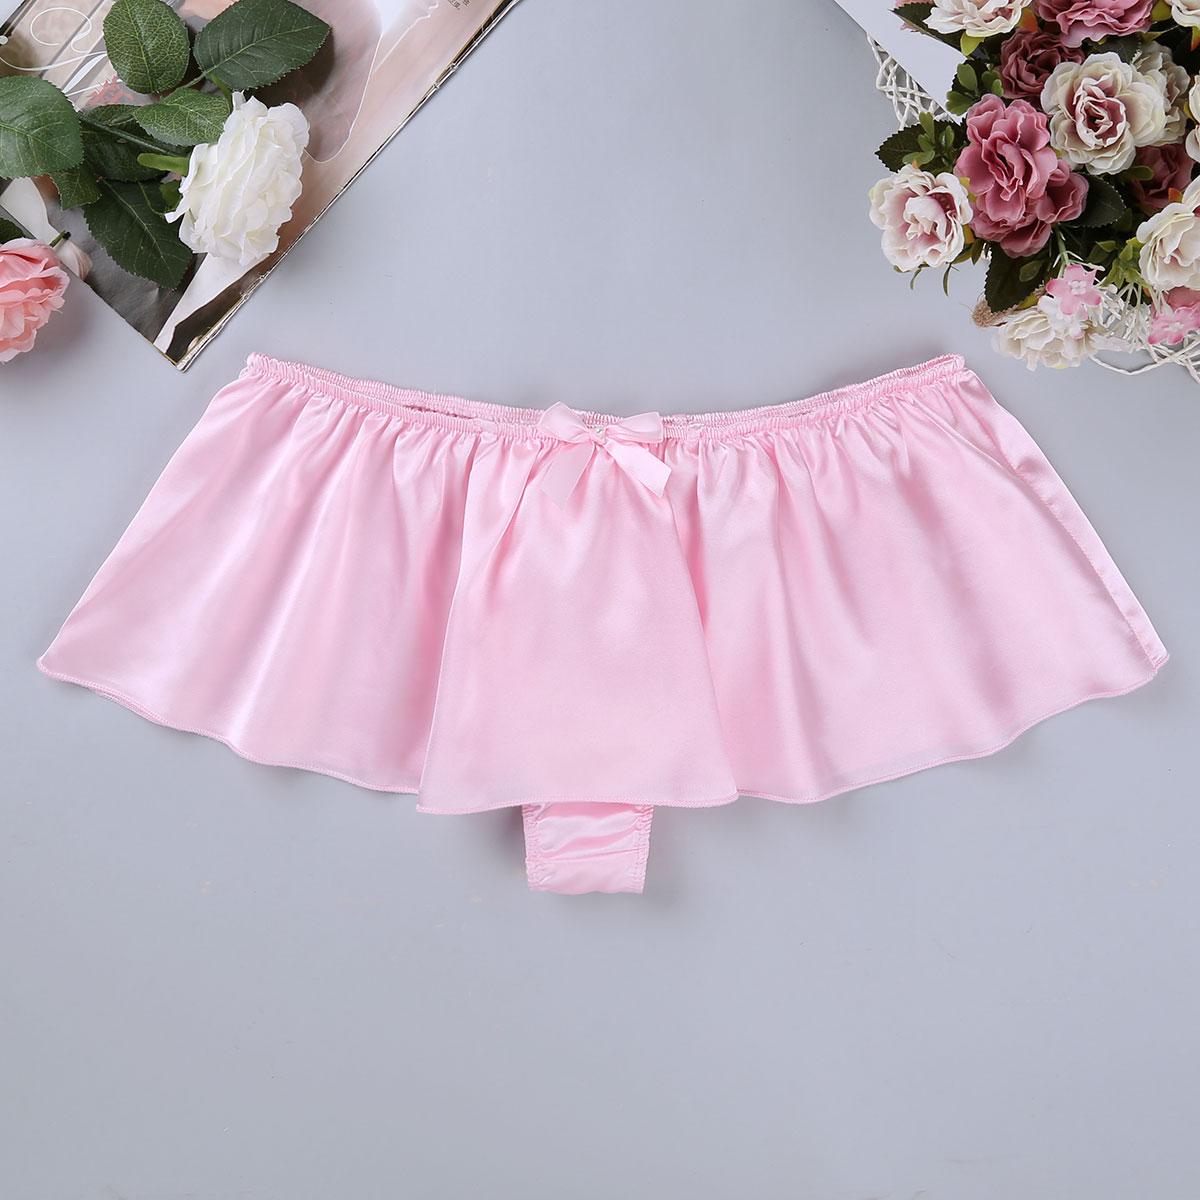 Soft Satin Gay Underwear Men Sissy Skirt Beach Dress -4084